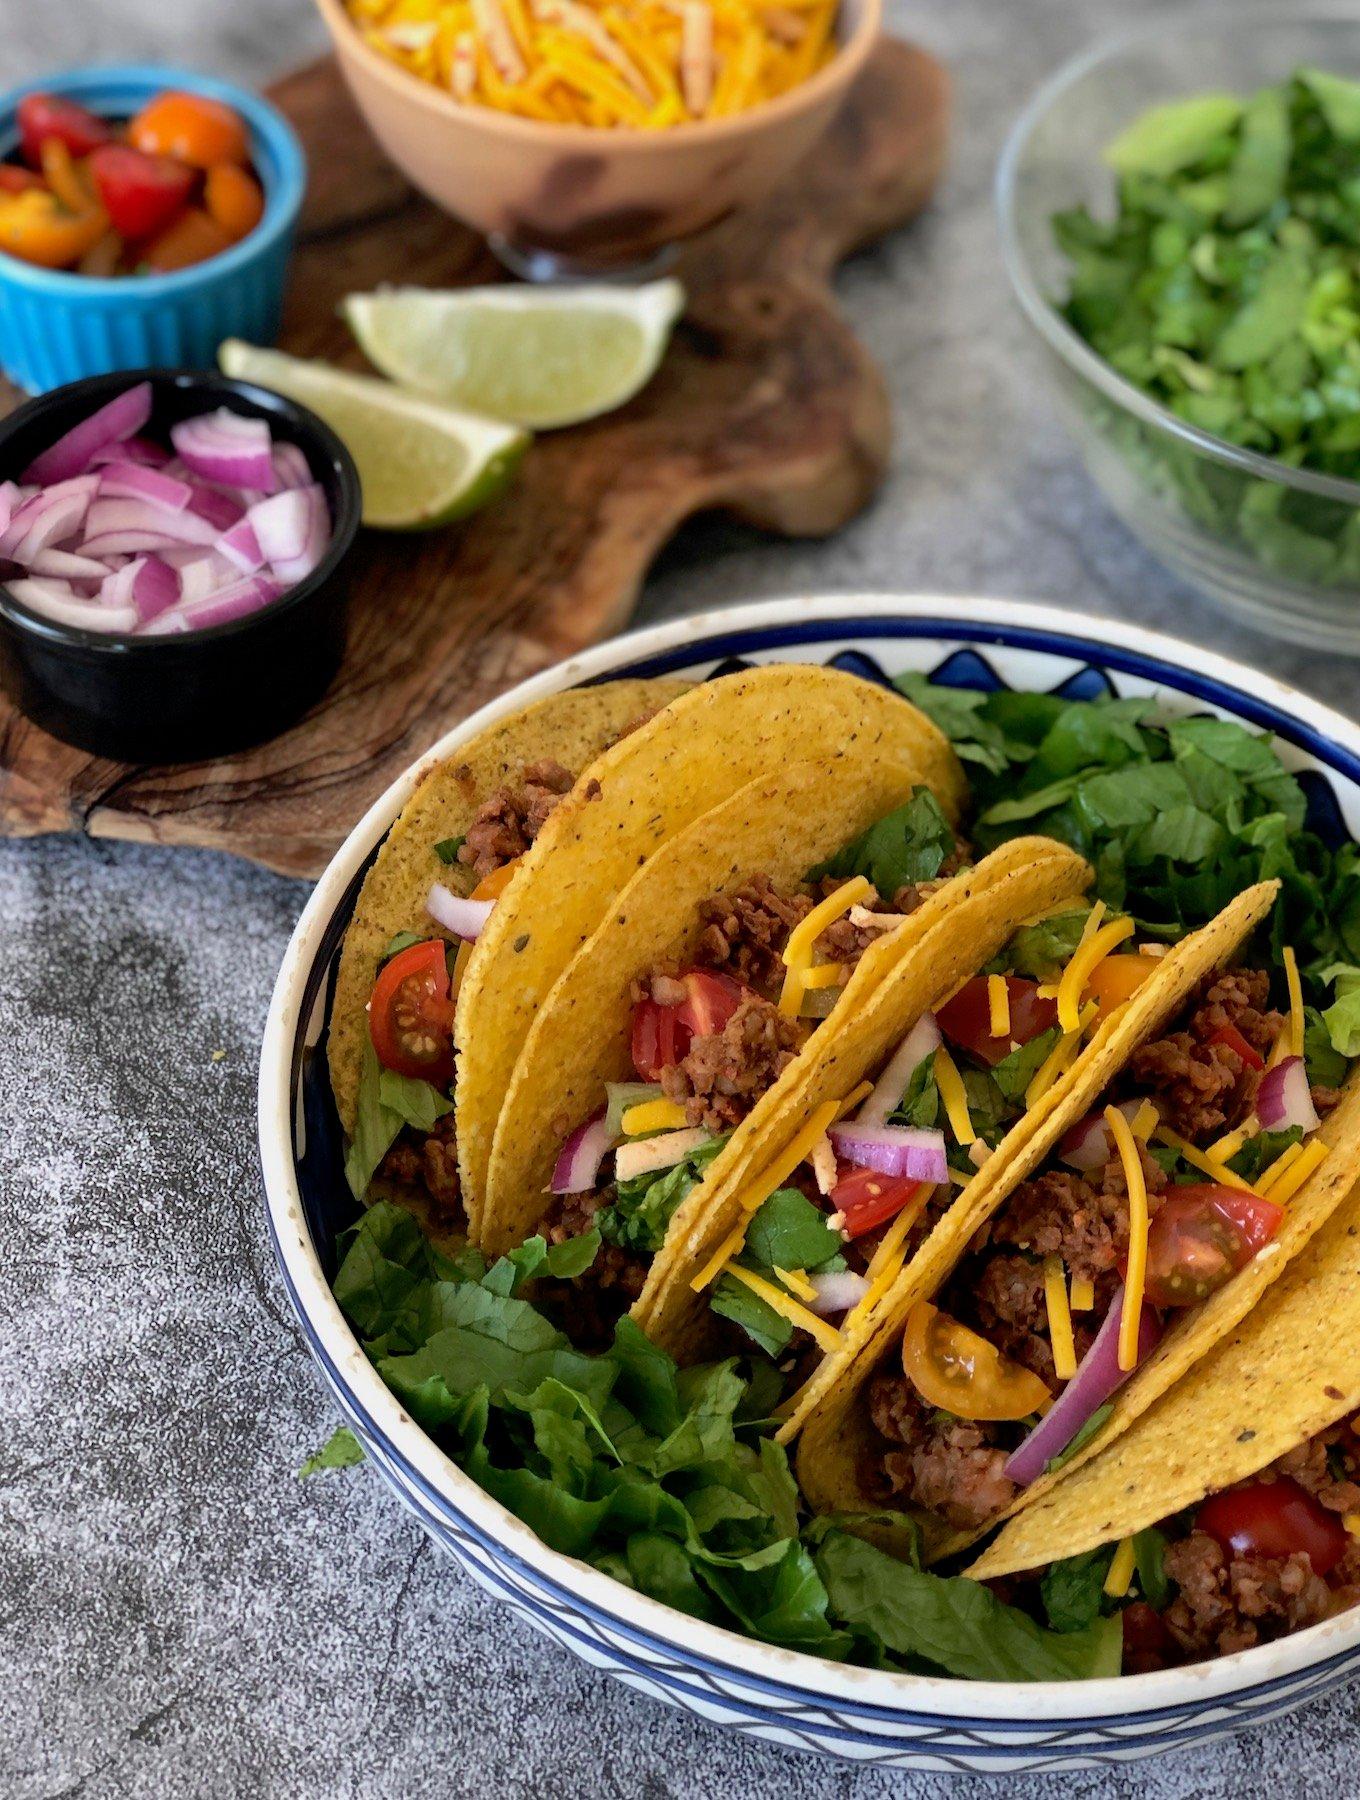 Beefless Taco Crumbles using walnuts, mushrooms, and bulgur or quinoa